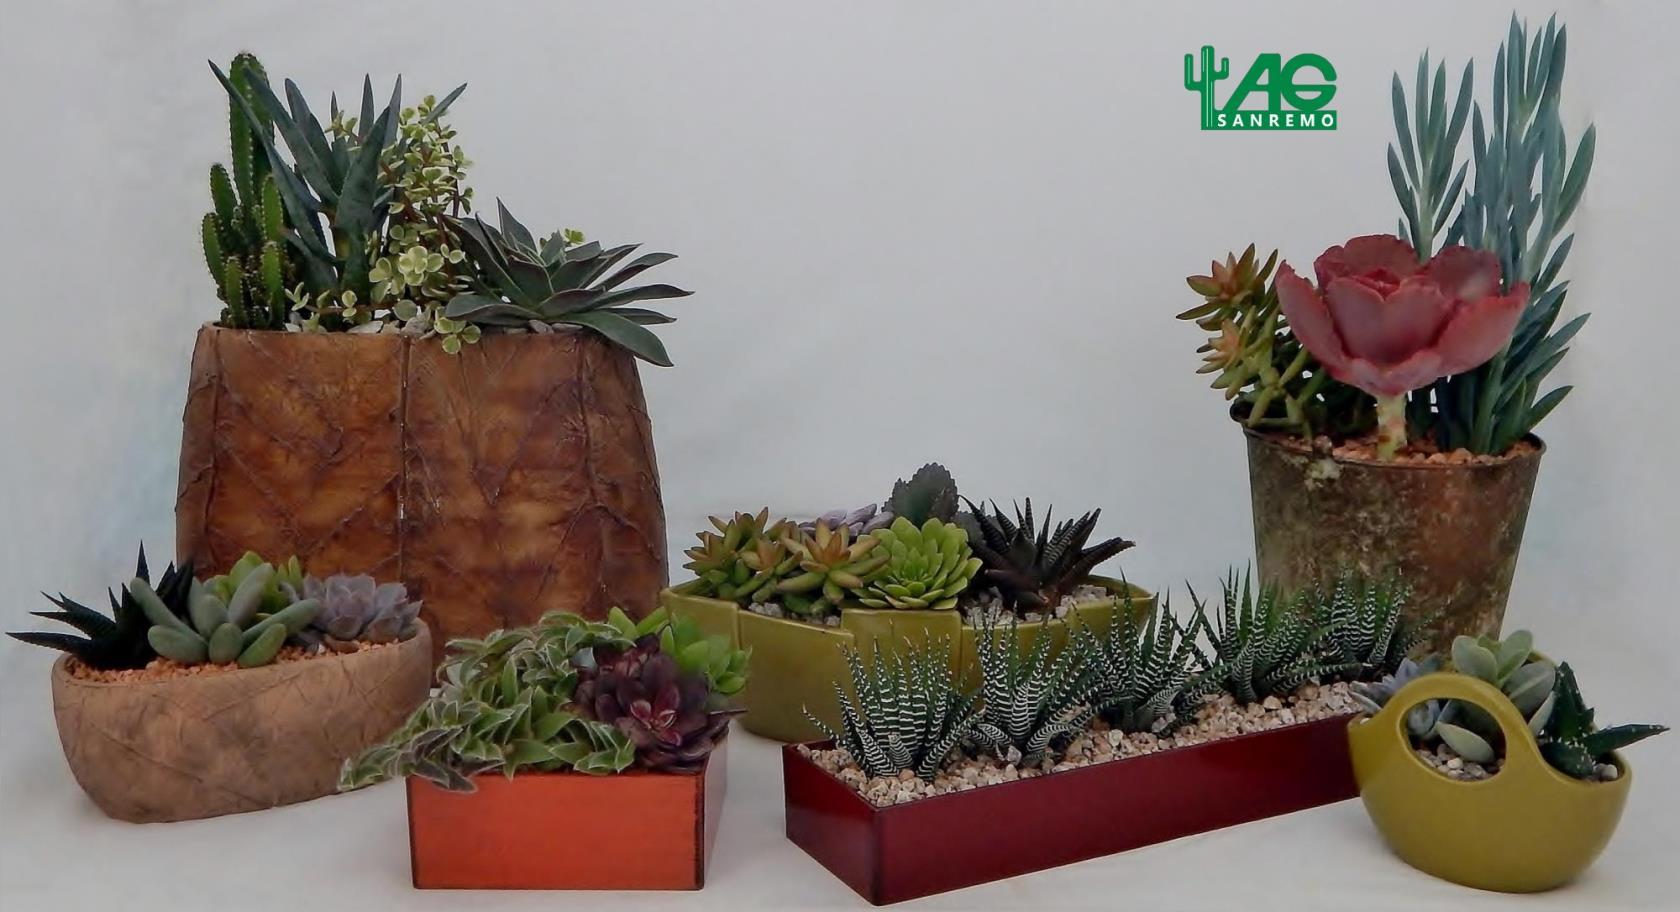 Composizioni Piante Grasse Cactacee Cactus  Piante Grasse in Vaso Sanremo Imperia Liguria | AG SANREMO